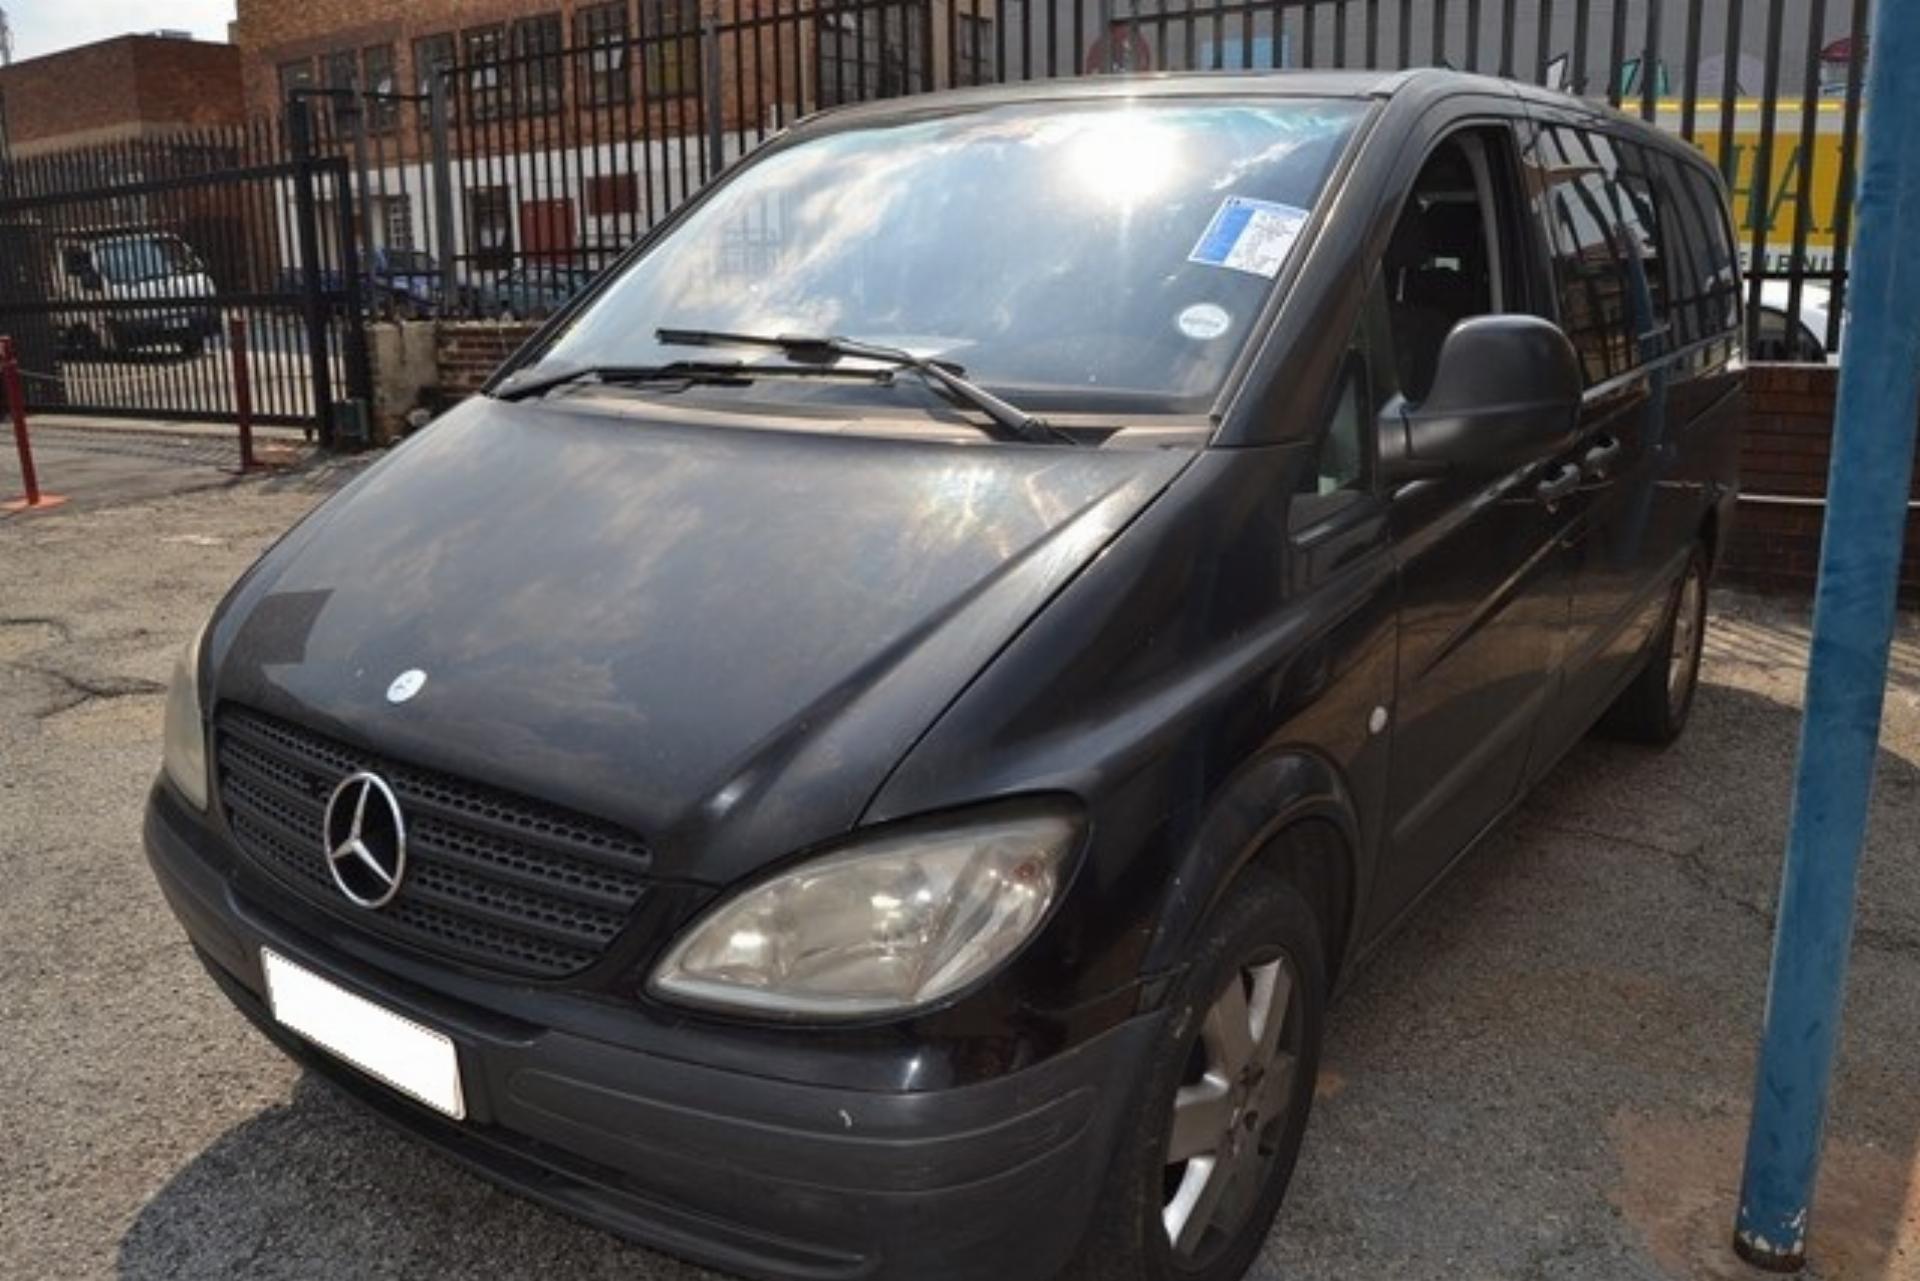 Repossessed Mercedes Benz Vito 115 2.2 2006 on auction - MC42854